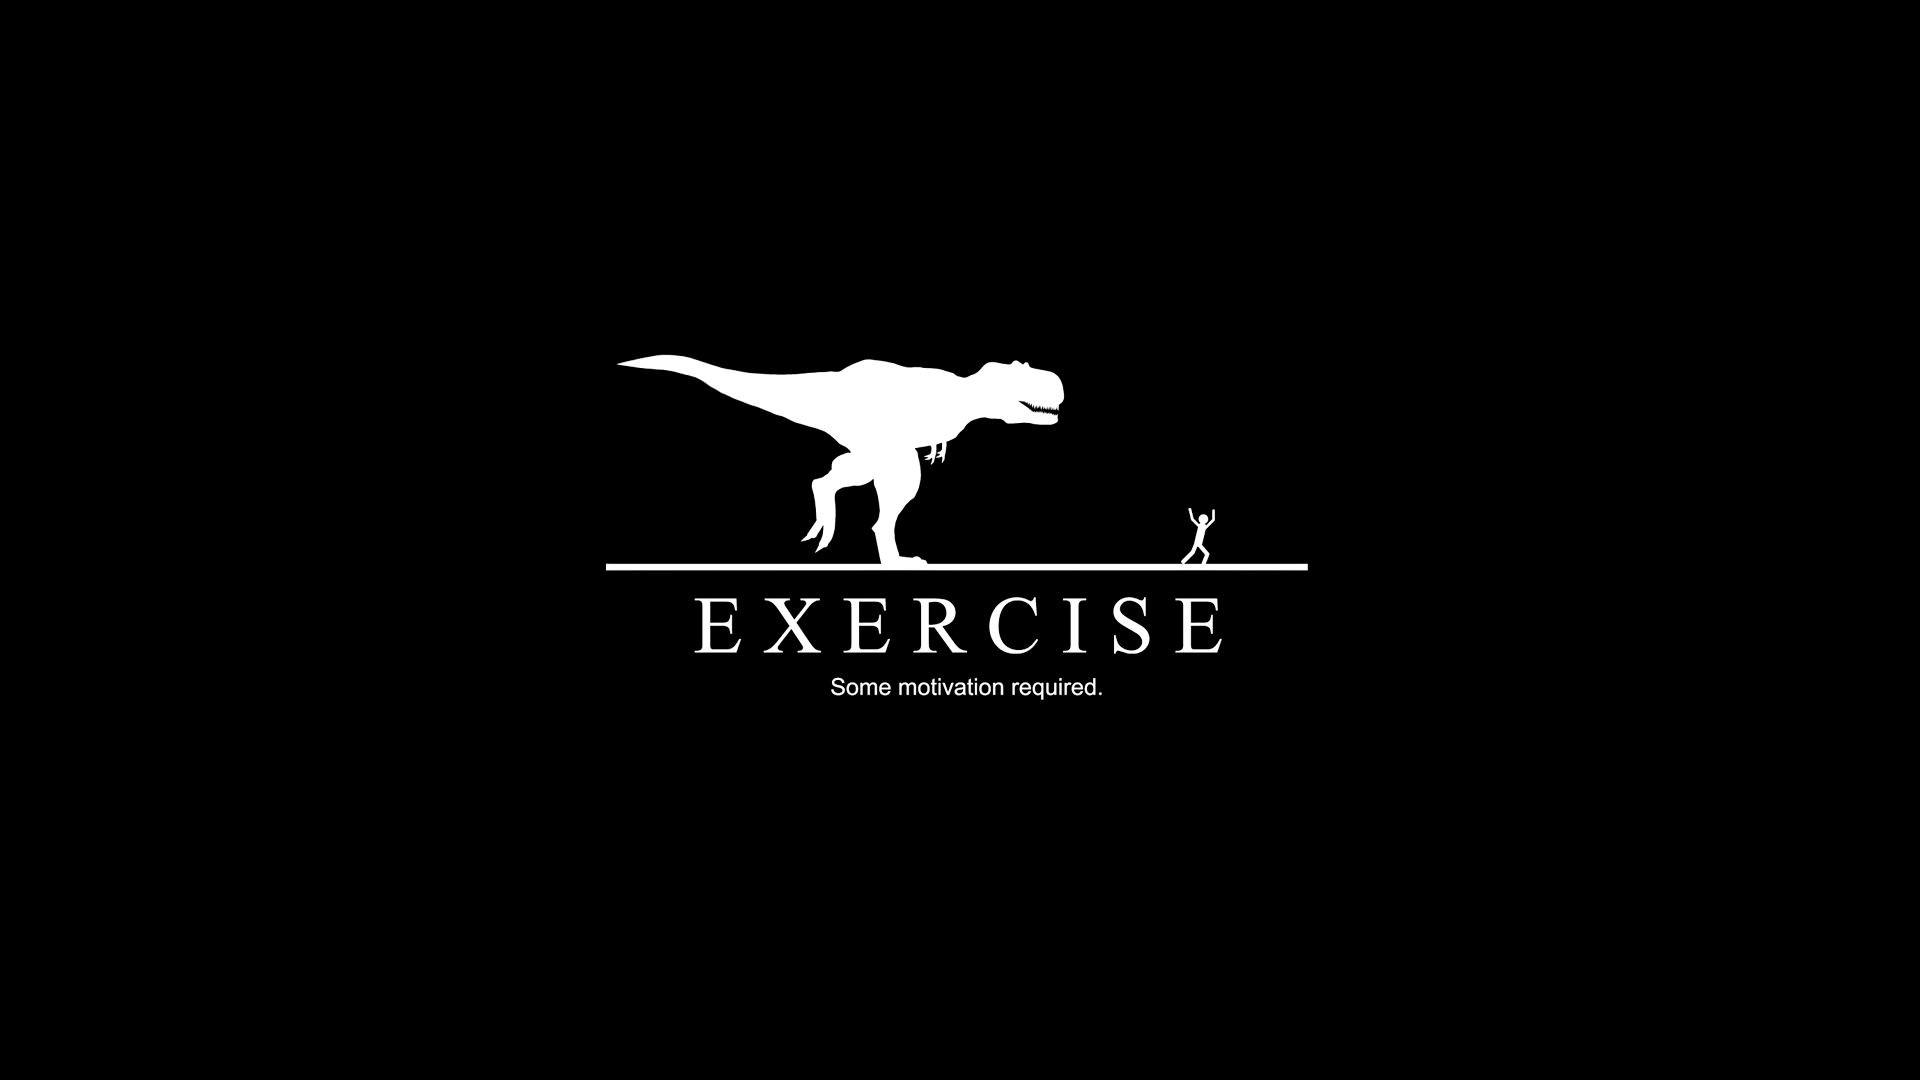 Workout Motivation Wallpaper iPhone (64+ images)